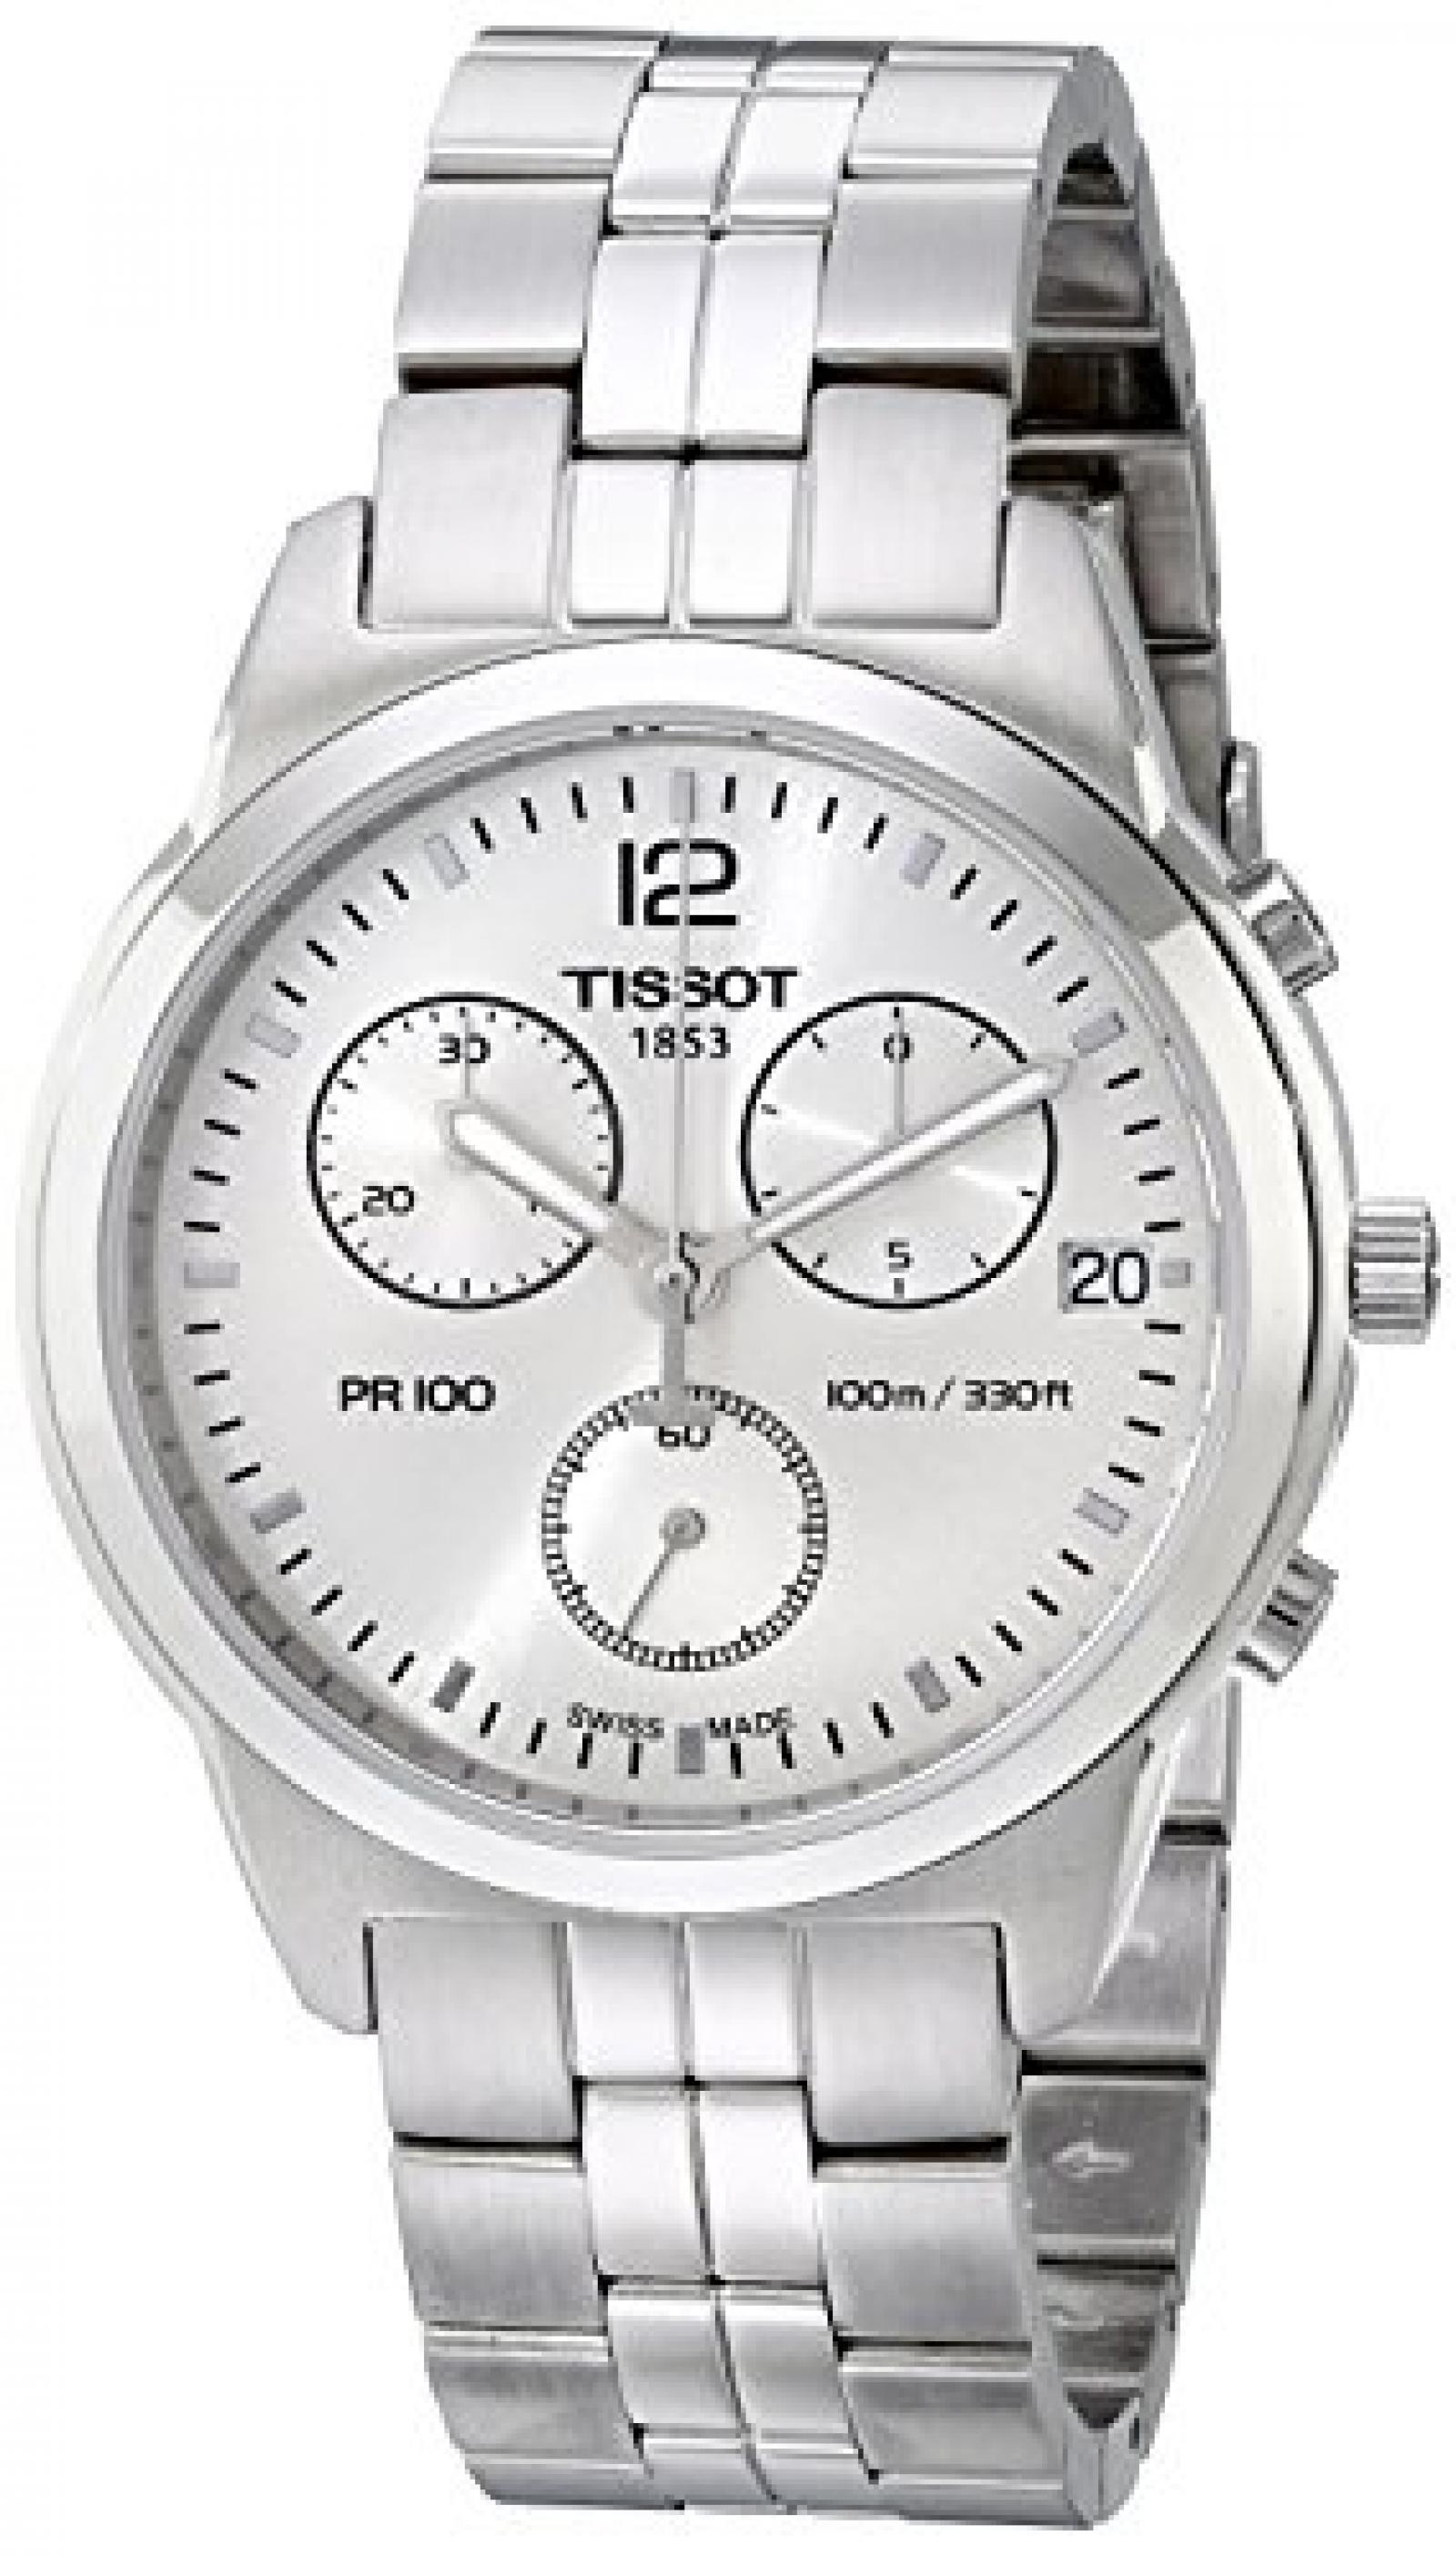 Herren-Armbanduhr XL Chronograph Quarz Edelstahl T049.417.11.037.00